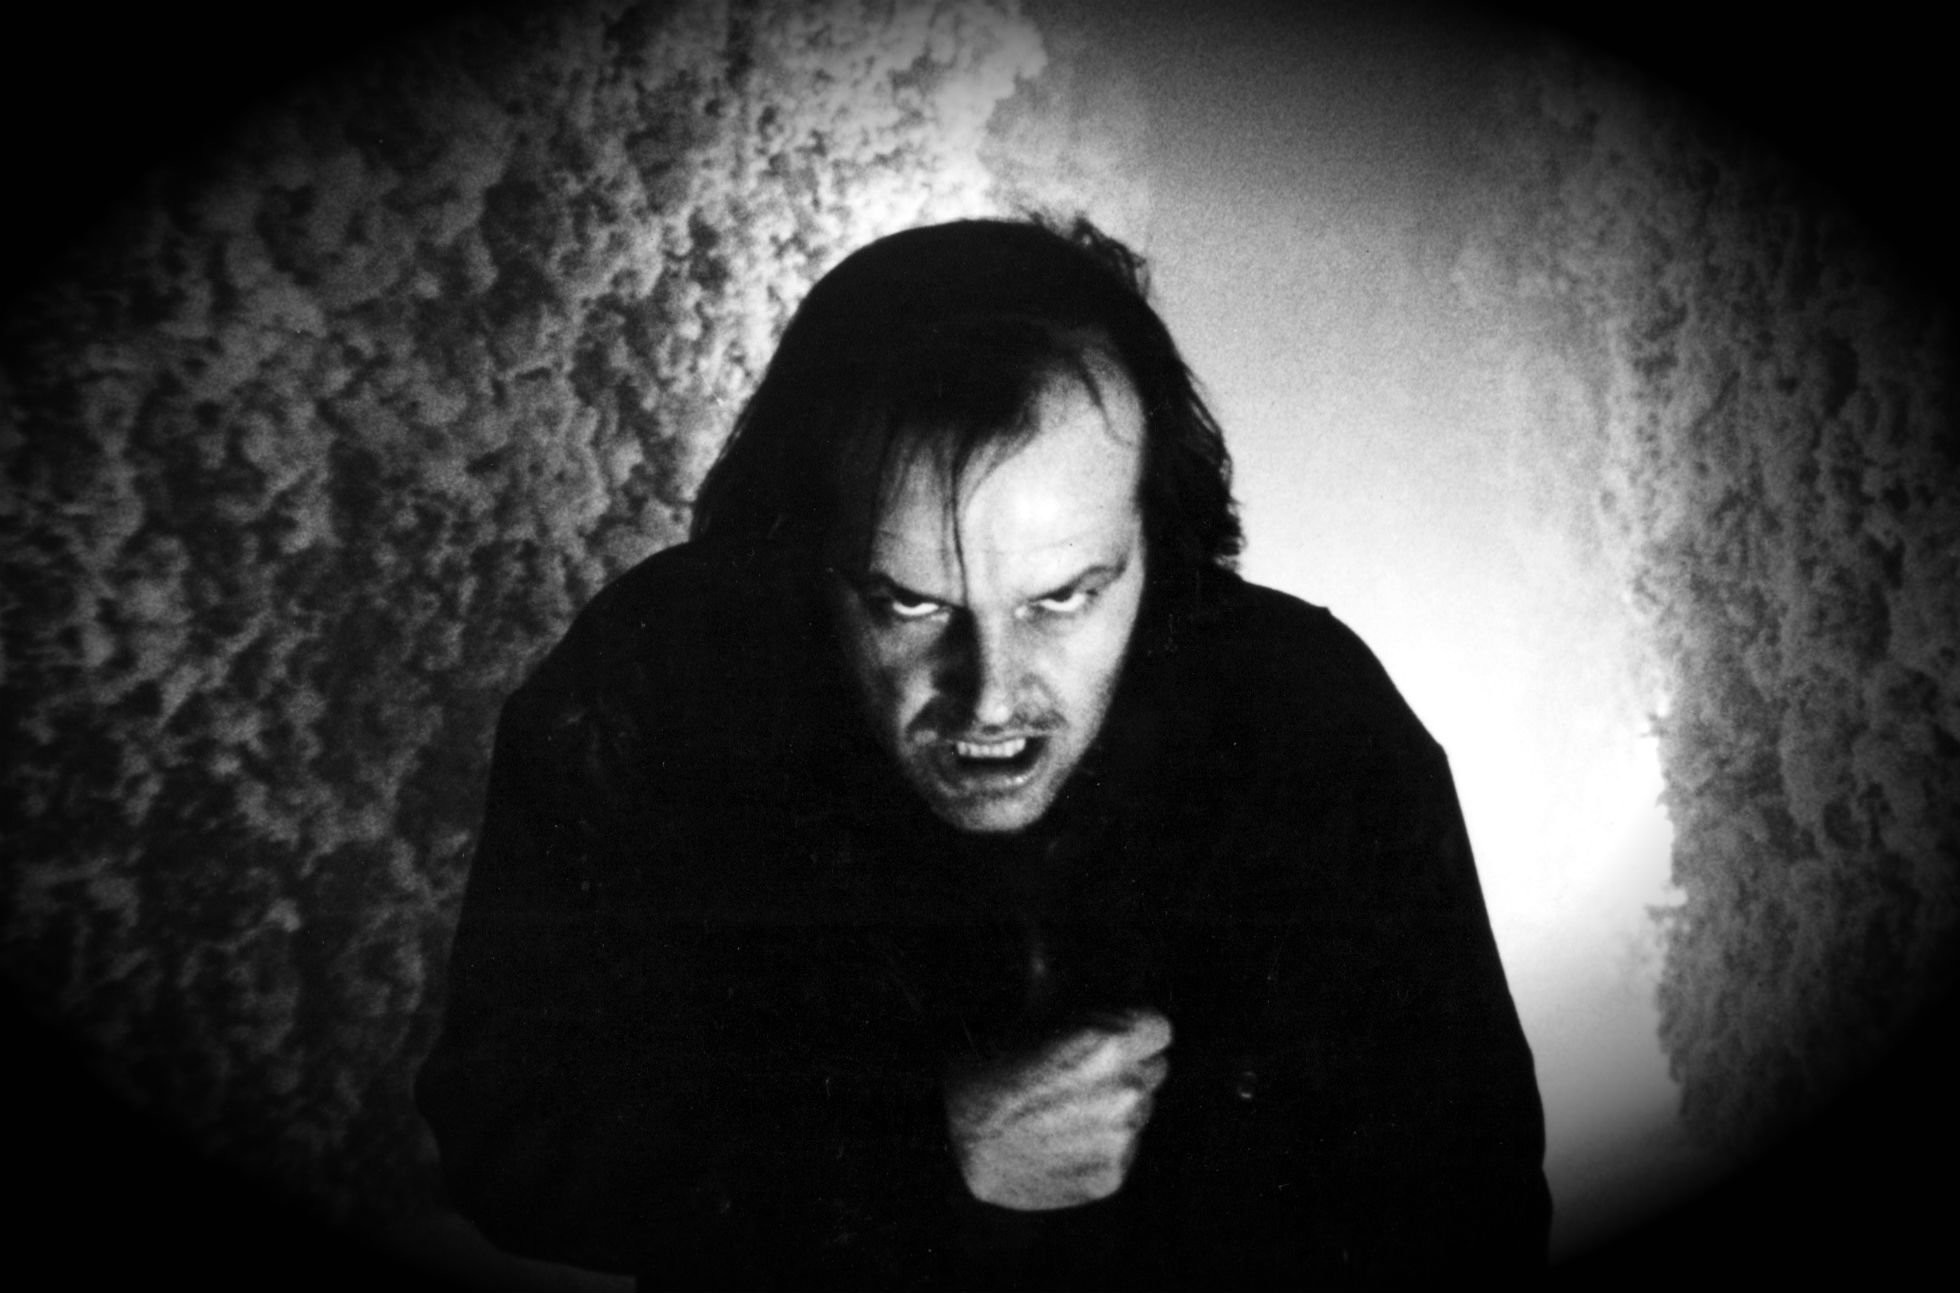 SHINING horror thriller dark movie film classic wallpaper background .